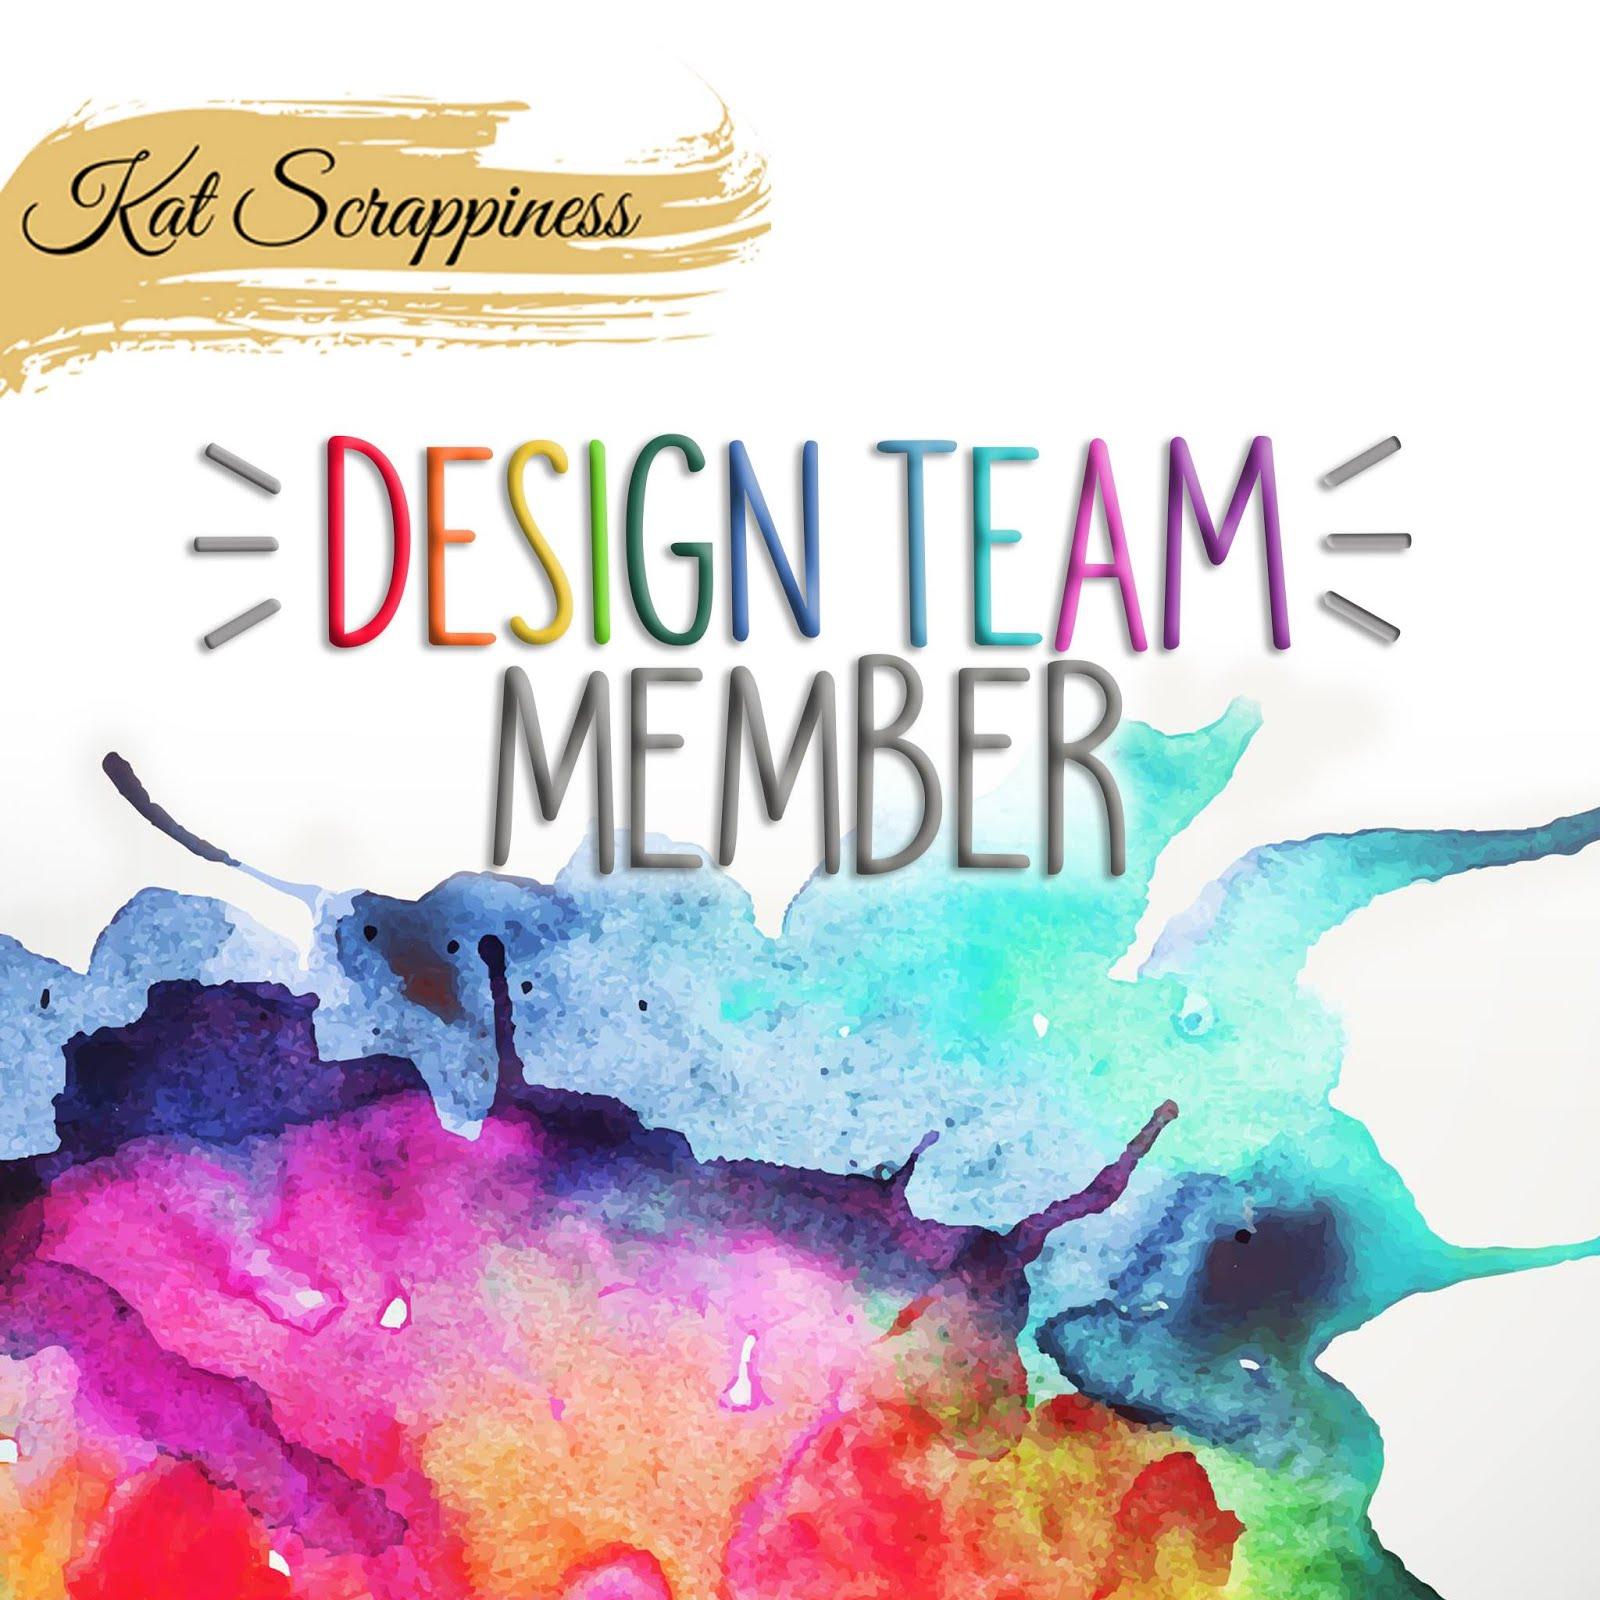 Kat Scrappiness Design Team